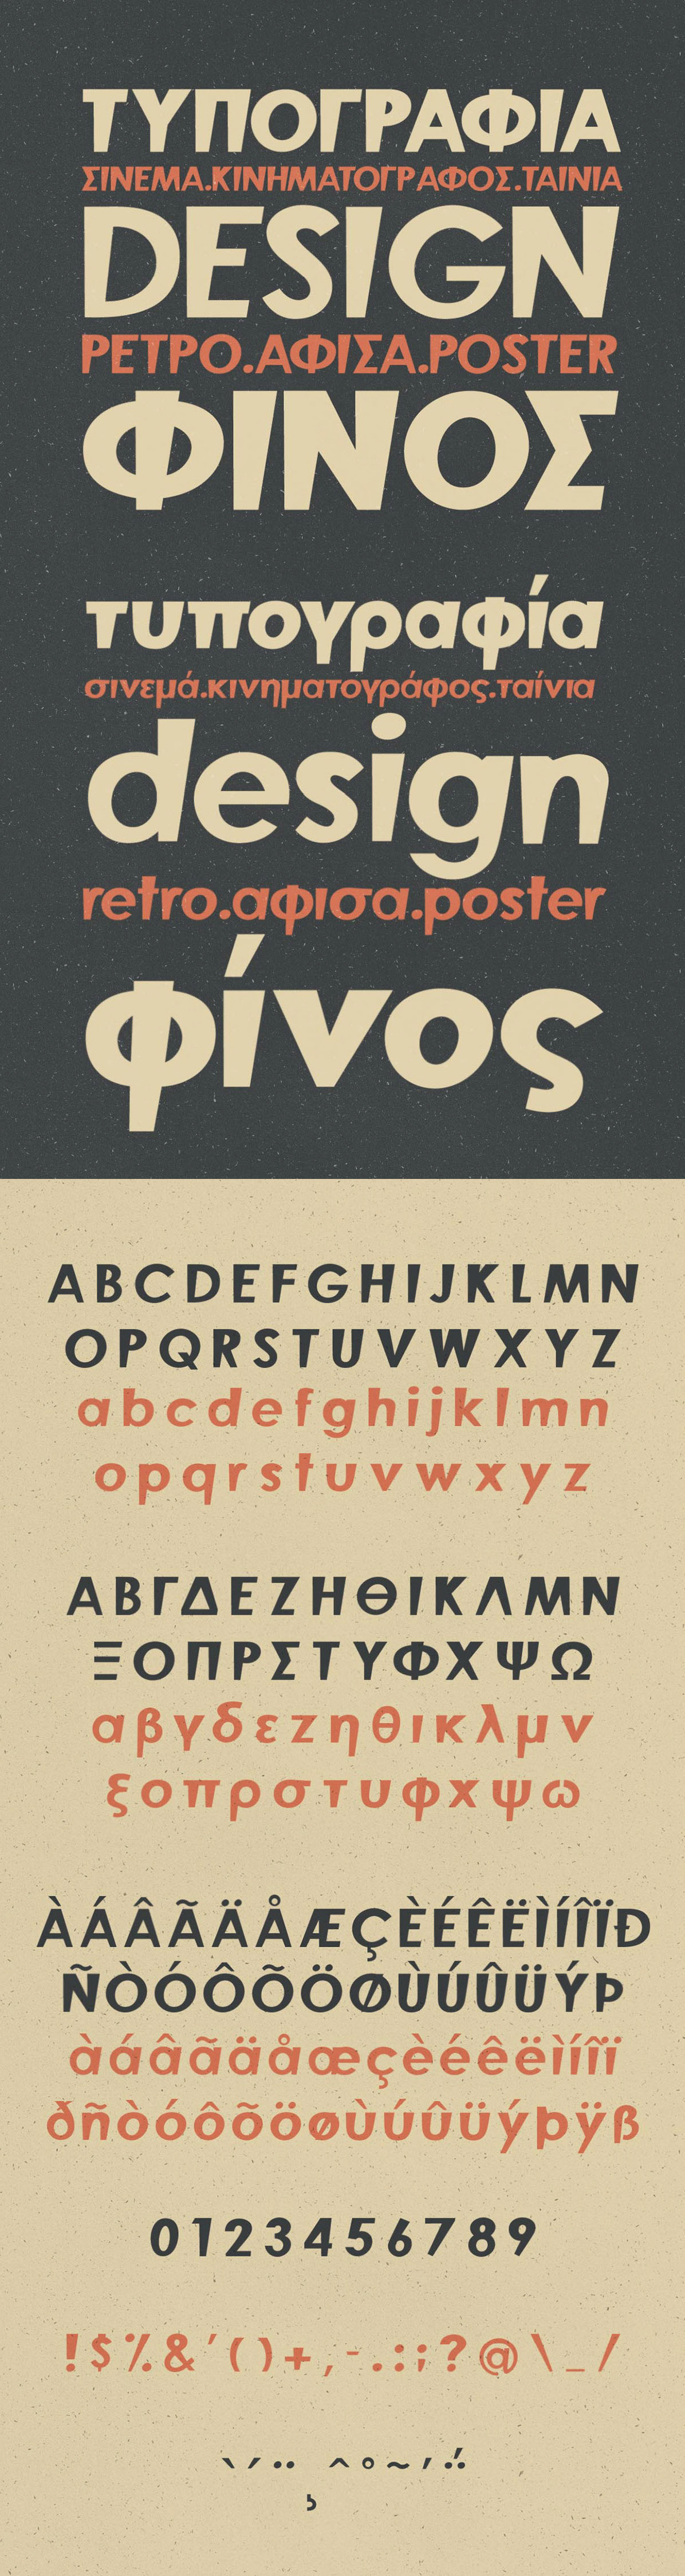 Finos typeface 2